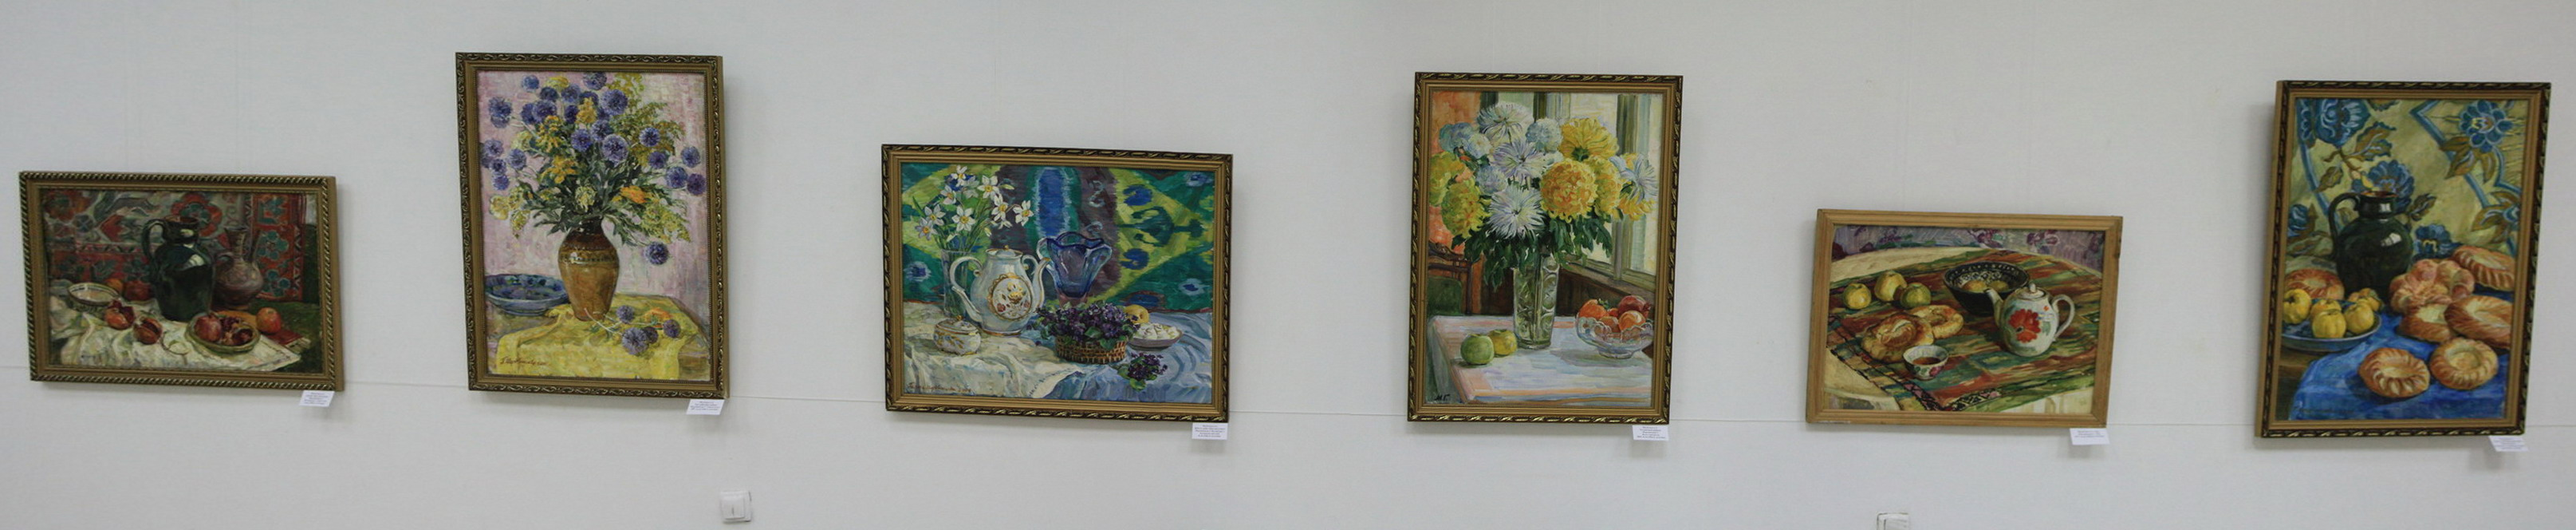 Экспозиция картин Мордвинцевой Галины.